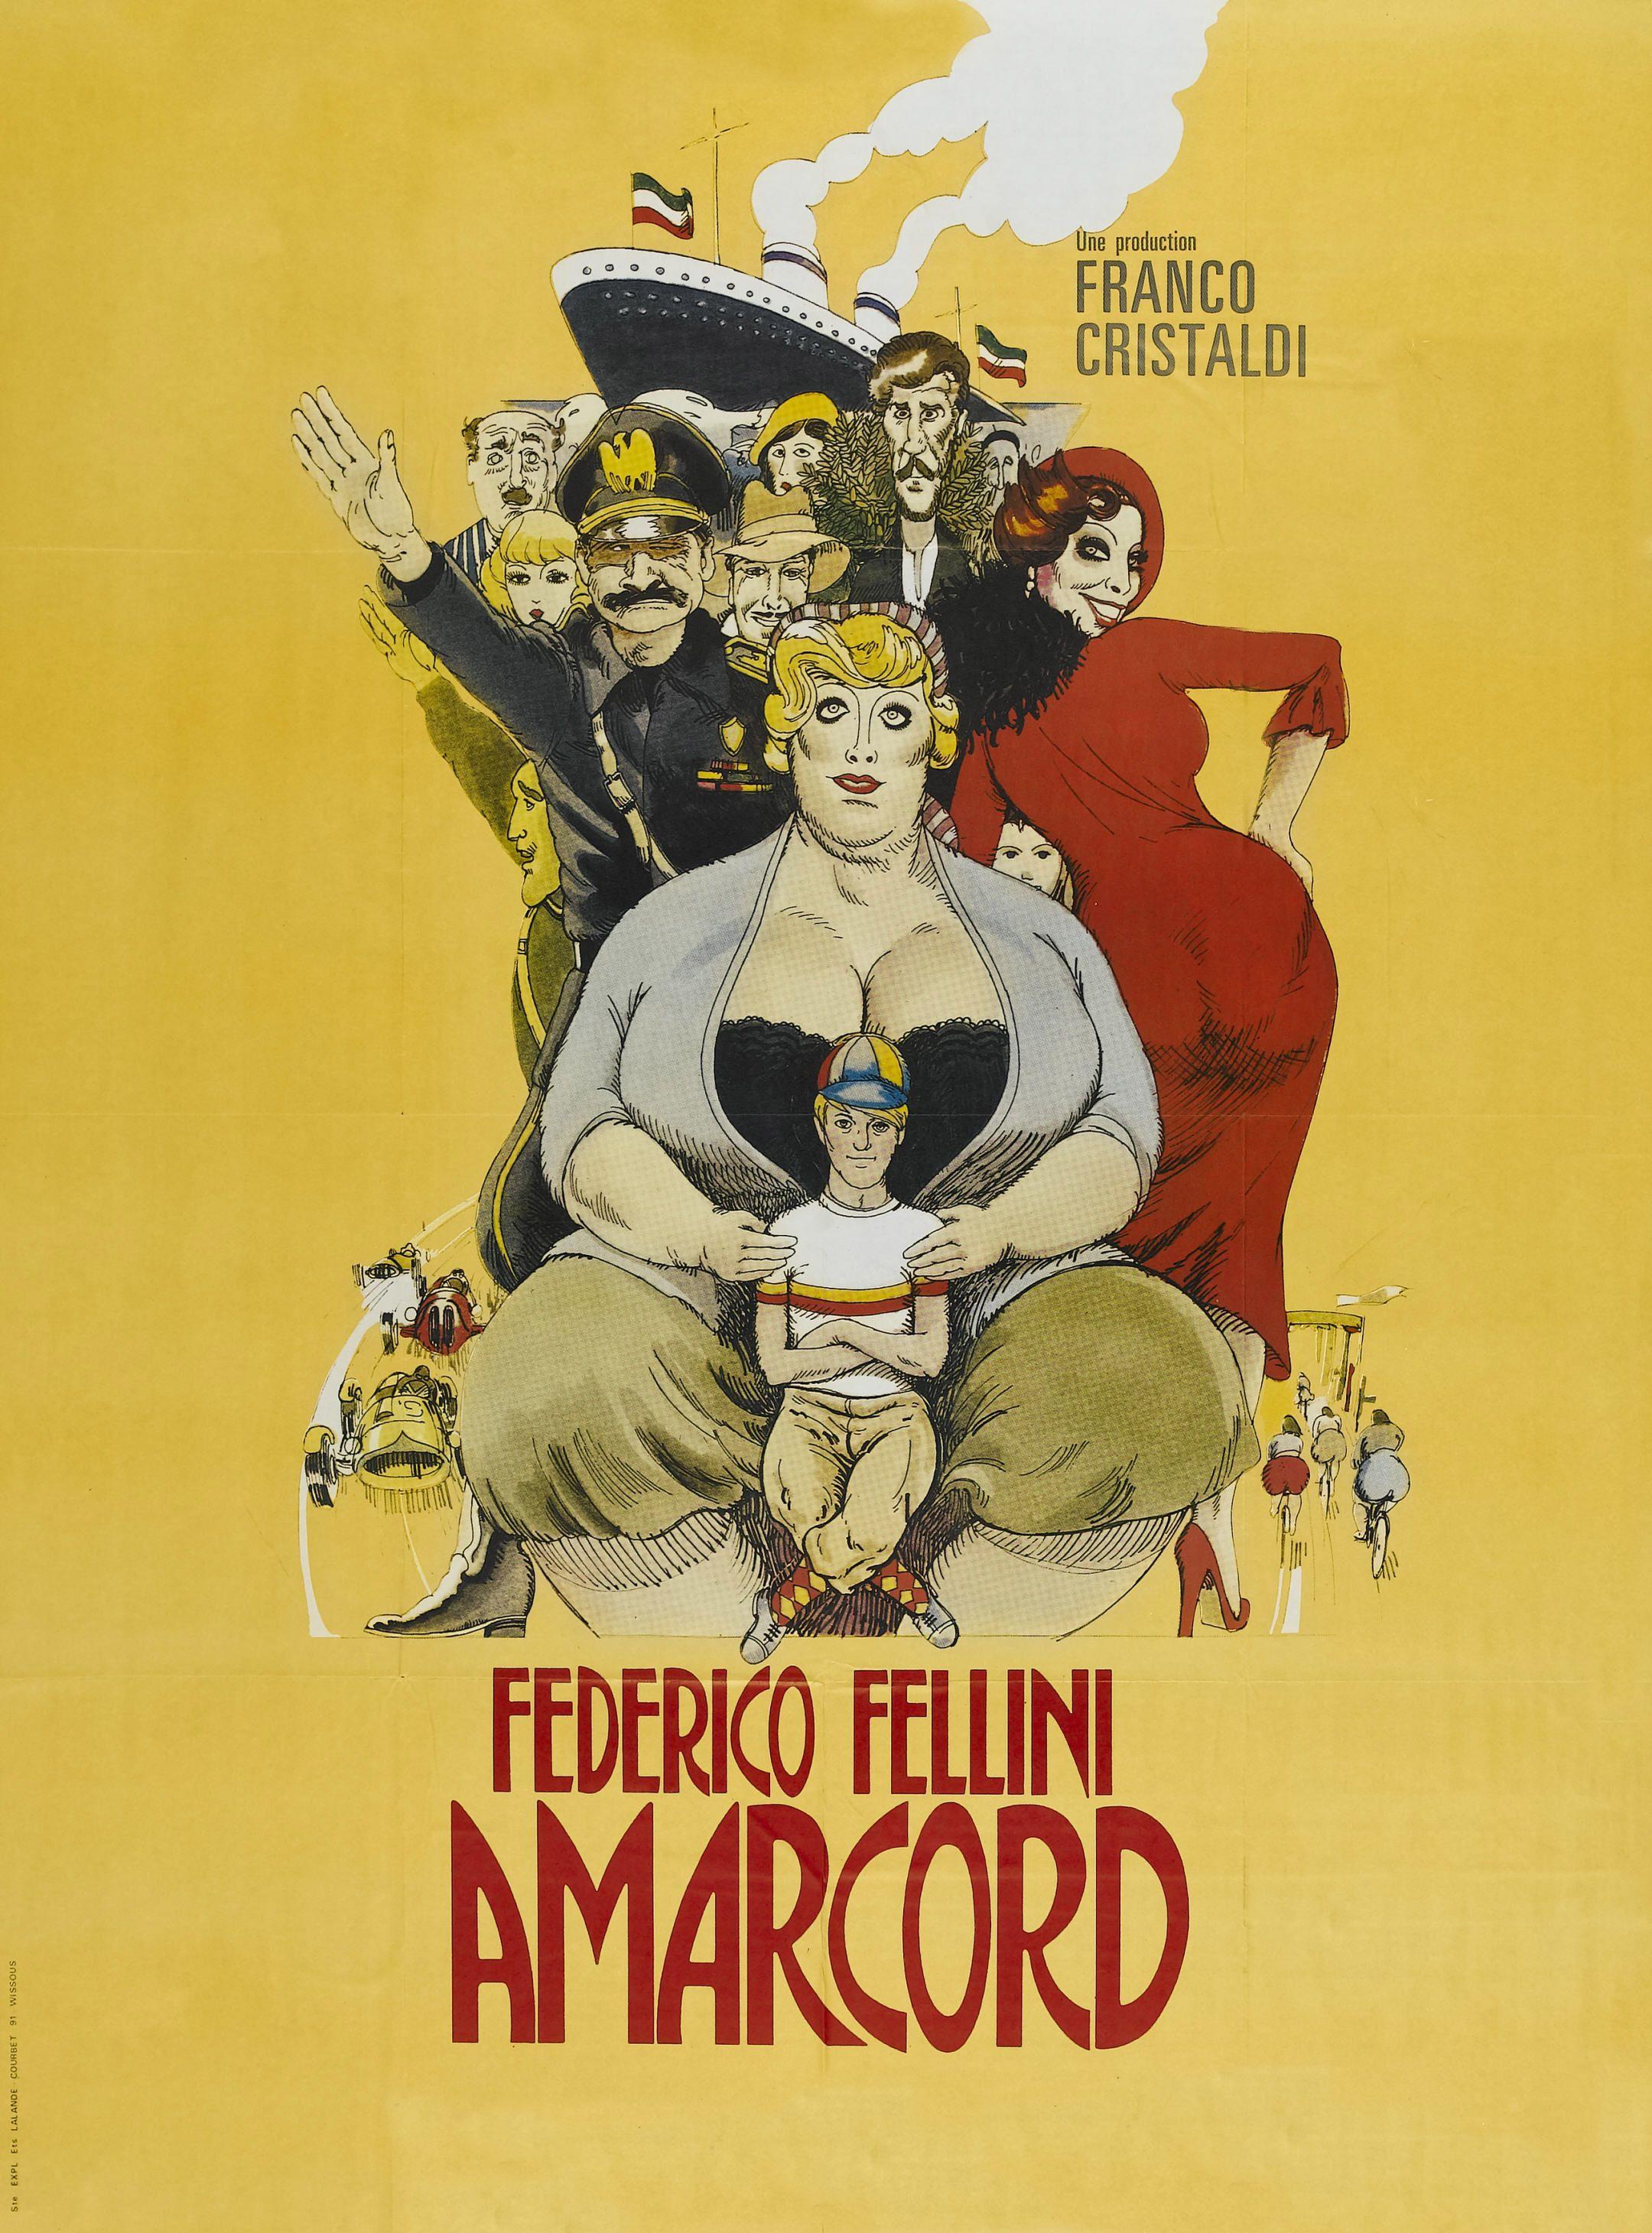 Amarcord Federico Fellini 1973 Cinema Film Classici Locandine Di Film